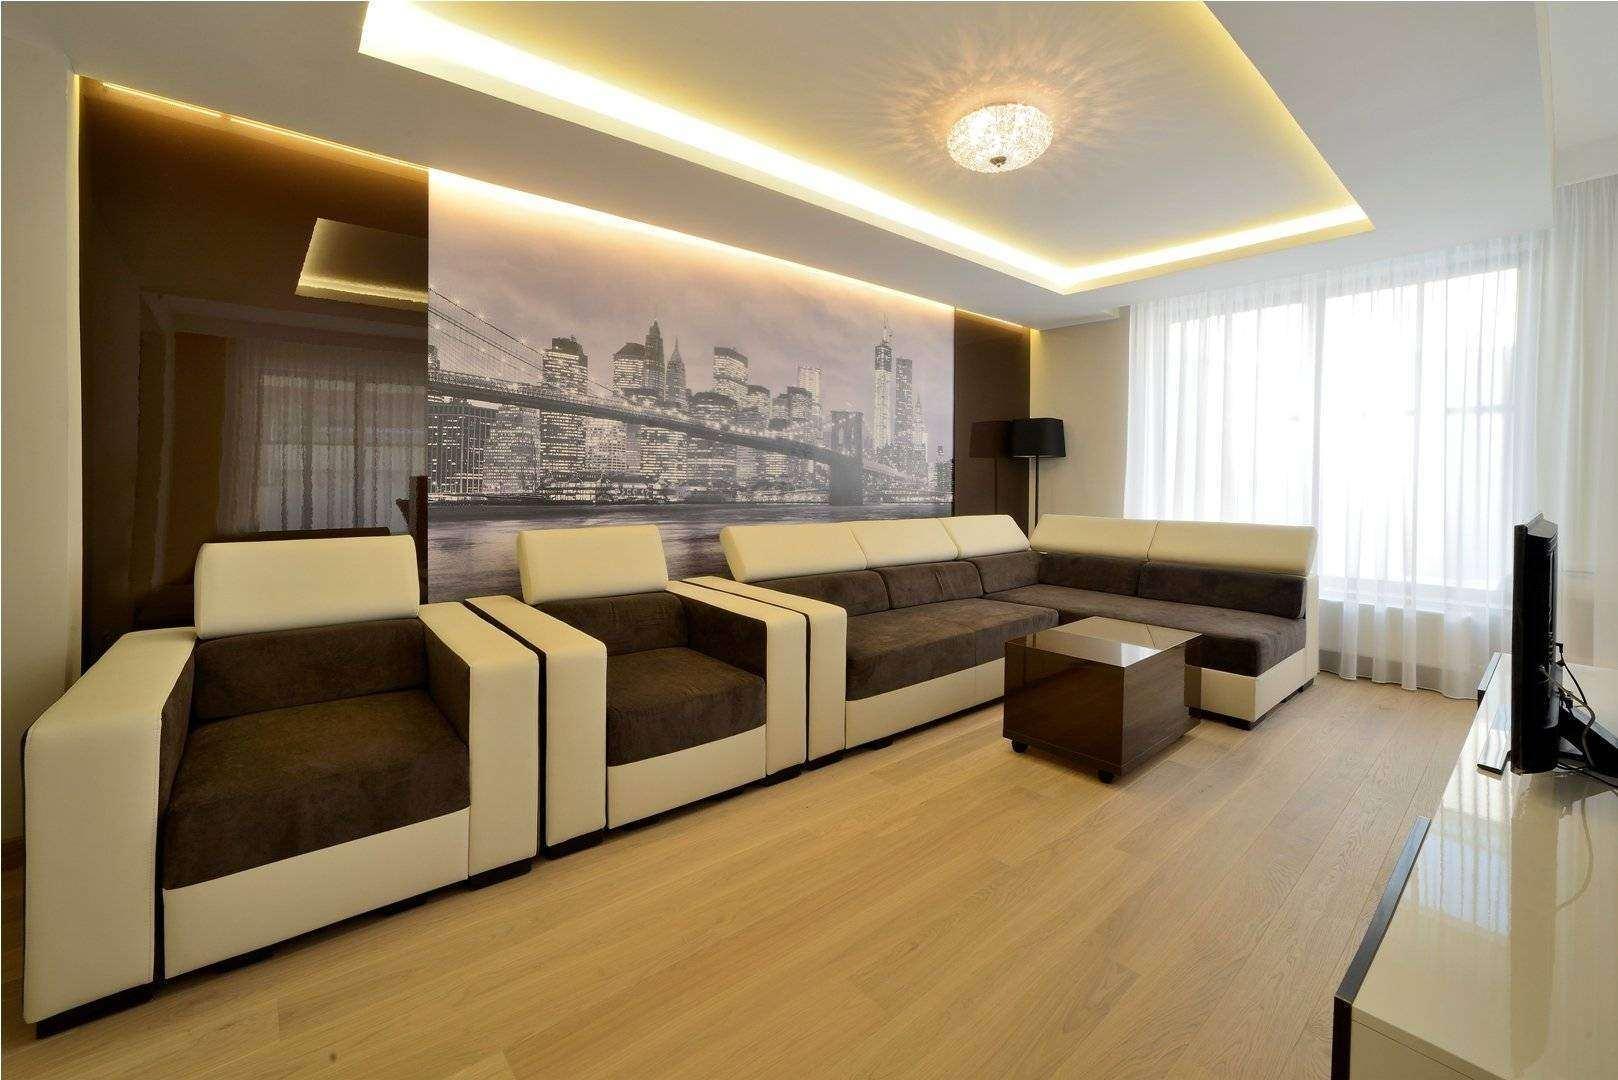 <a href=&quot;design interior living ,cu mobila living moderna la comanda &quot;>Coltar living extensibil , mobila linvinf moderna<img src='https://www.unican.ro/wp-content/themes/vita/img/dreapta.png' class='pull-right hidden-xs' style='margin-right:-10px;margin-top:-10px; max-height:41px'></a>